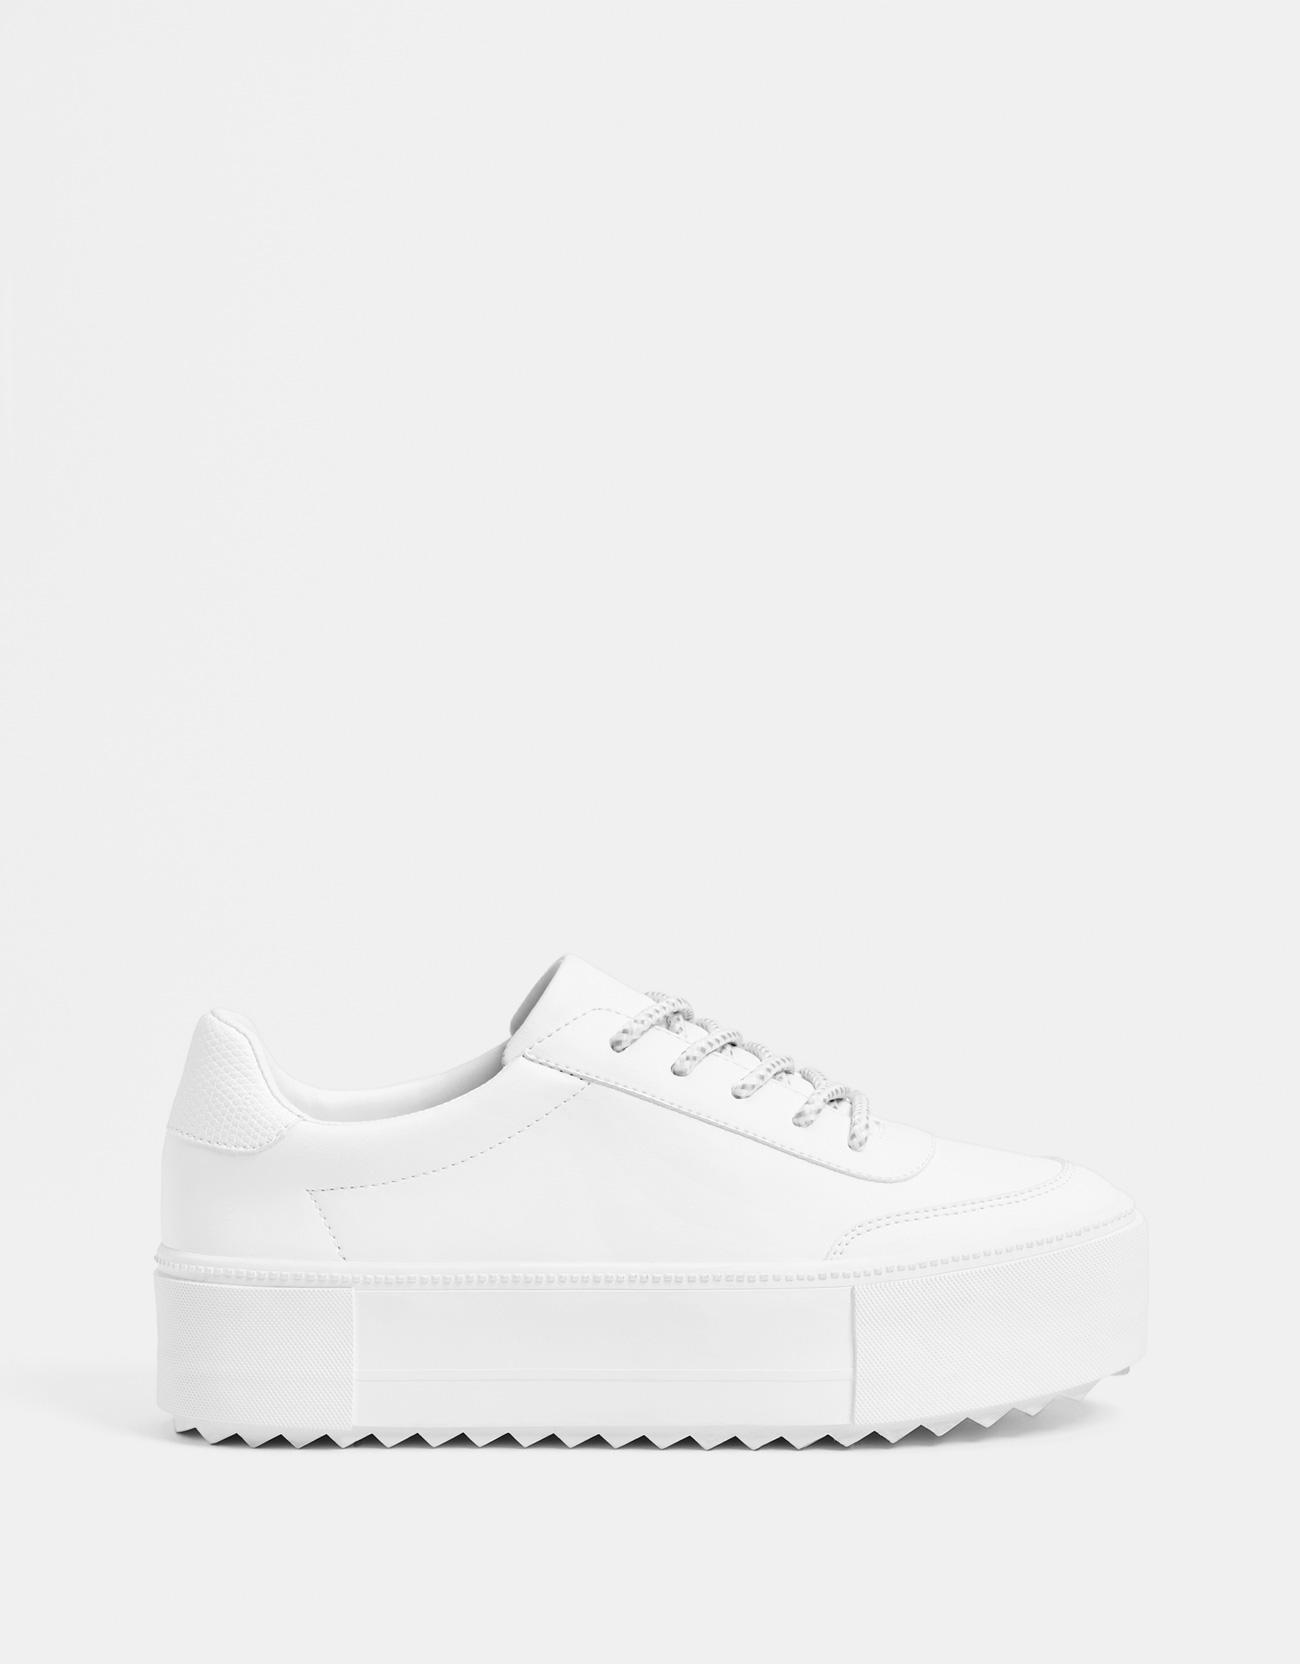 369e4a824365 White platform sneakers - Shoes - Bershka Bosnia and Herzegovina